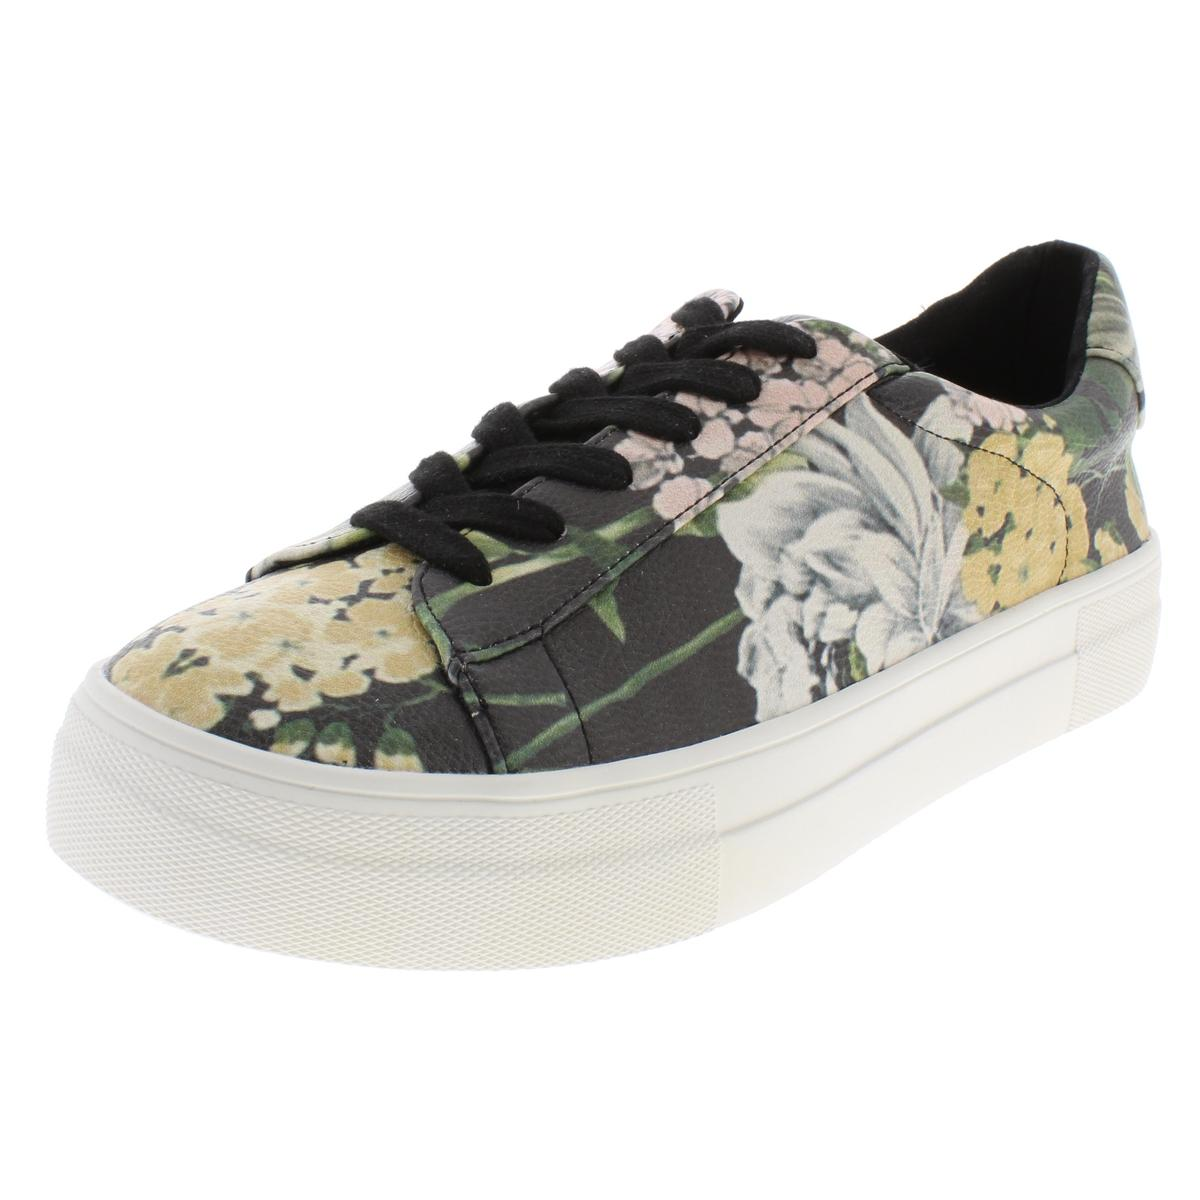 8e13f02b1ba Details about Steve Madden Womens Gisela Black Sneaker Sneakers Shoes 7  Medium (B,M) BHFO 9173